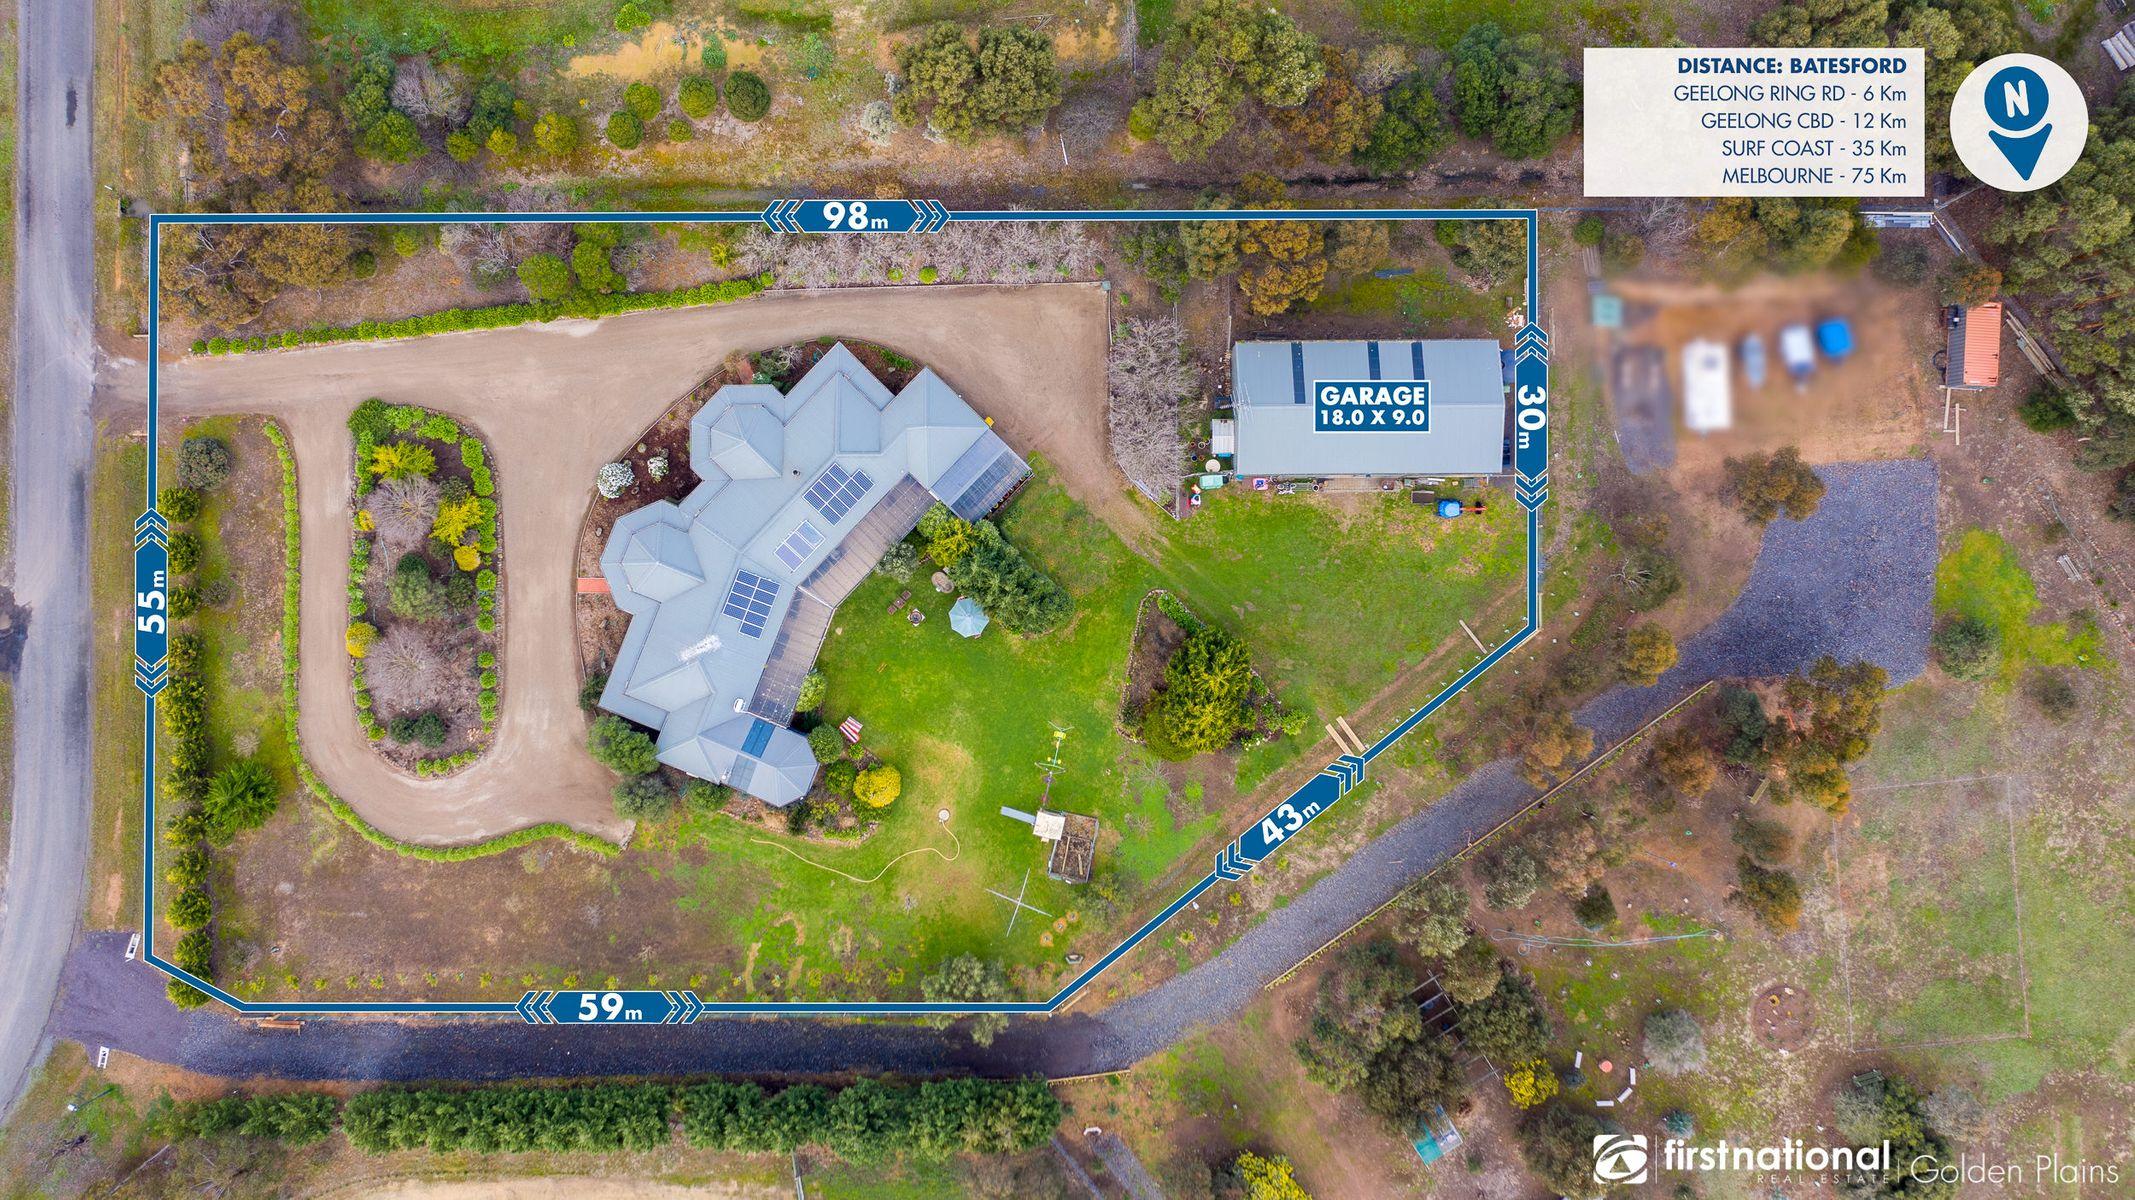 135 Tolloora Way, Batesford, VIC 3213